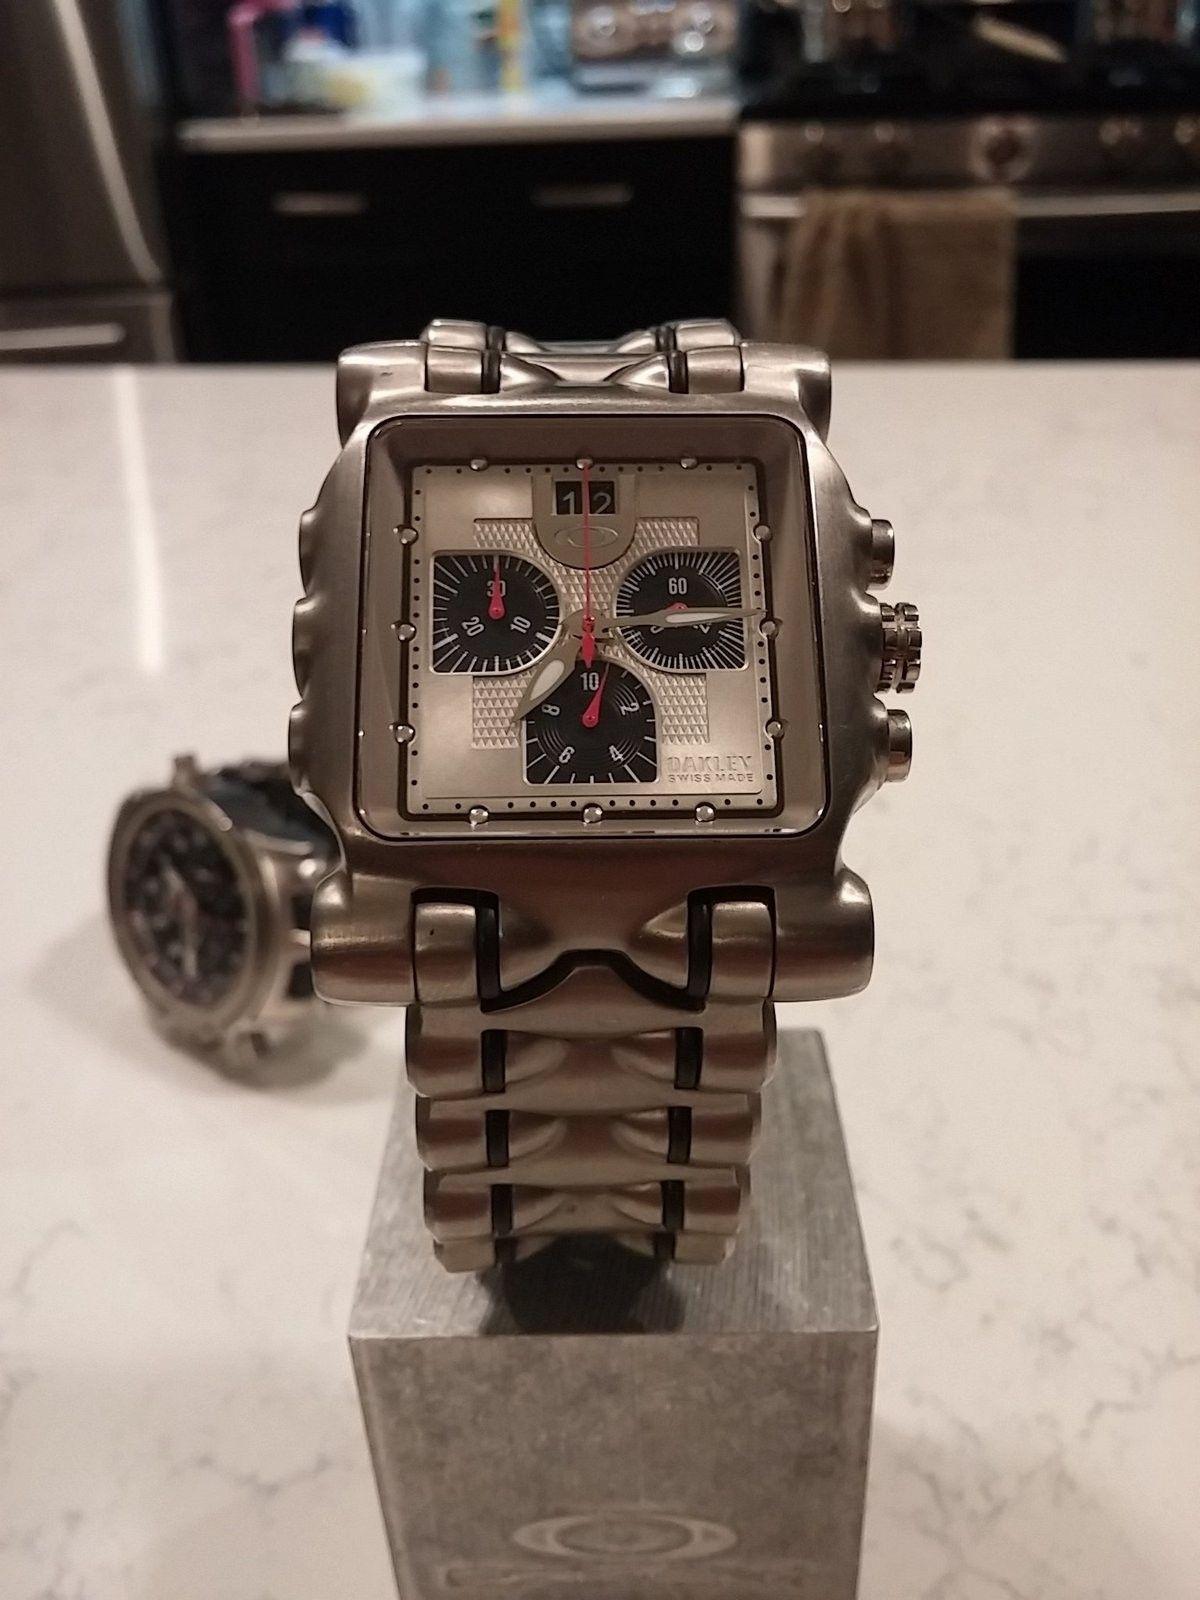 Watch Sale v2.0 - Timebomb x3, 12 Gauge, Minute Machine, Judge, Blade - 20150315_201425.jpg